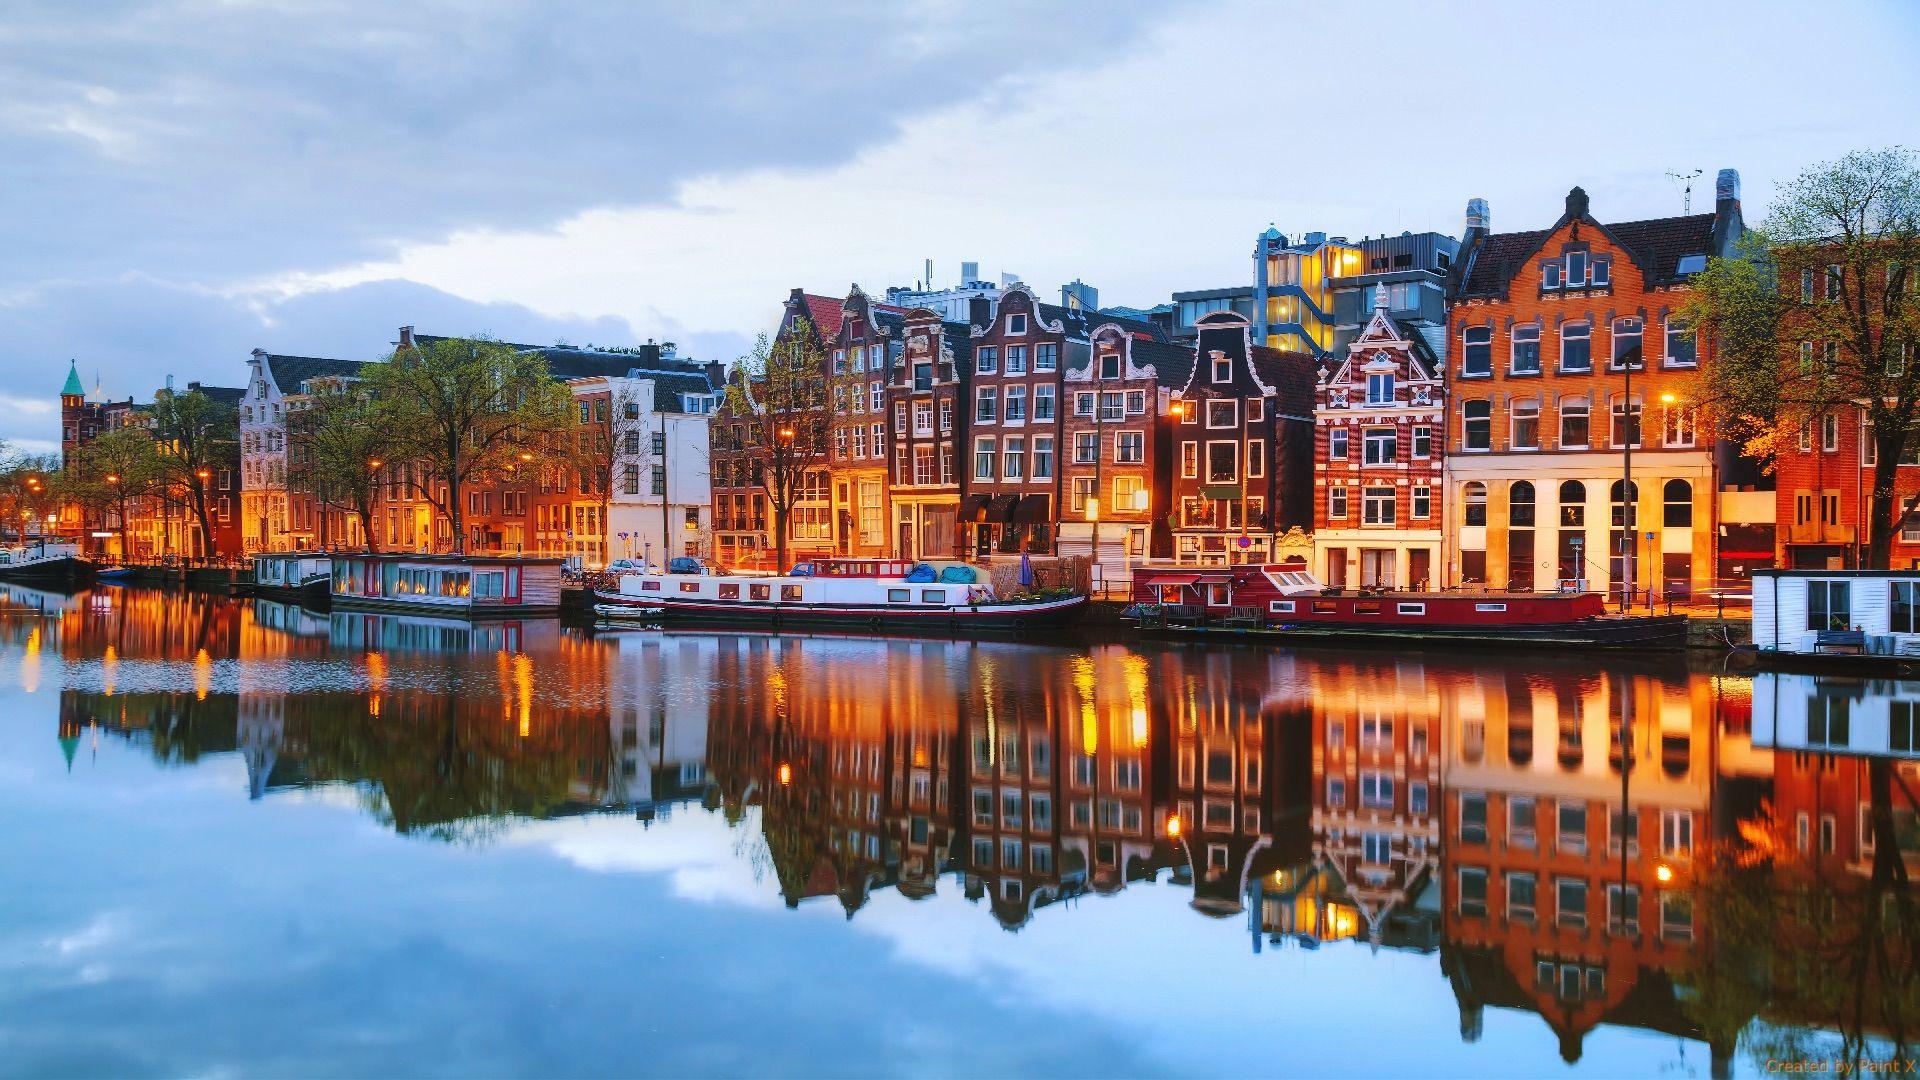 Amsterdam wallpaper photo hd